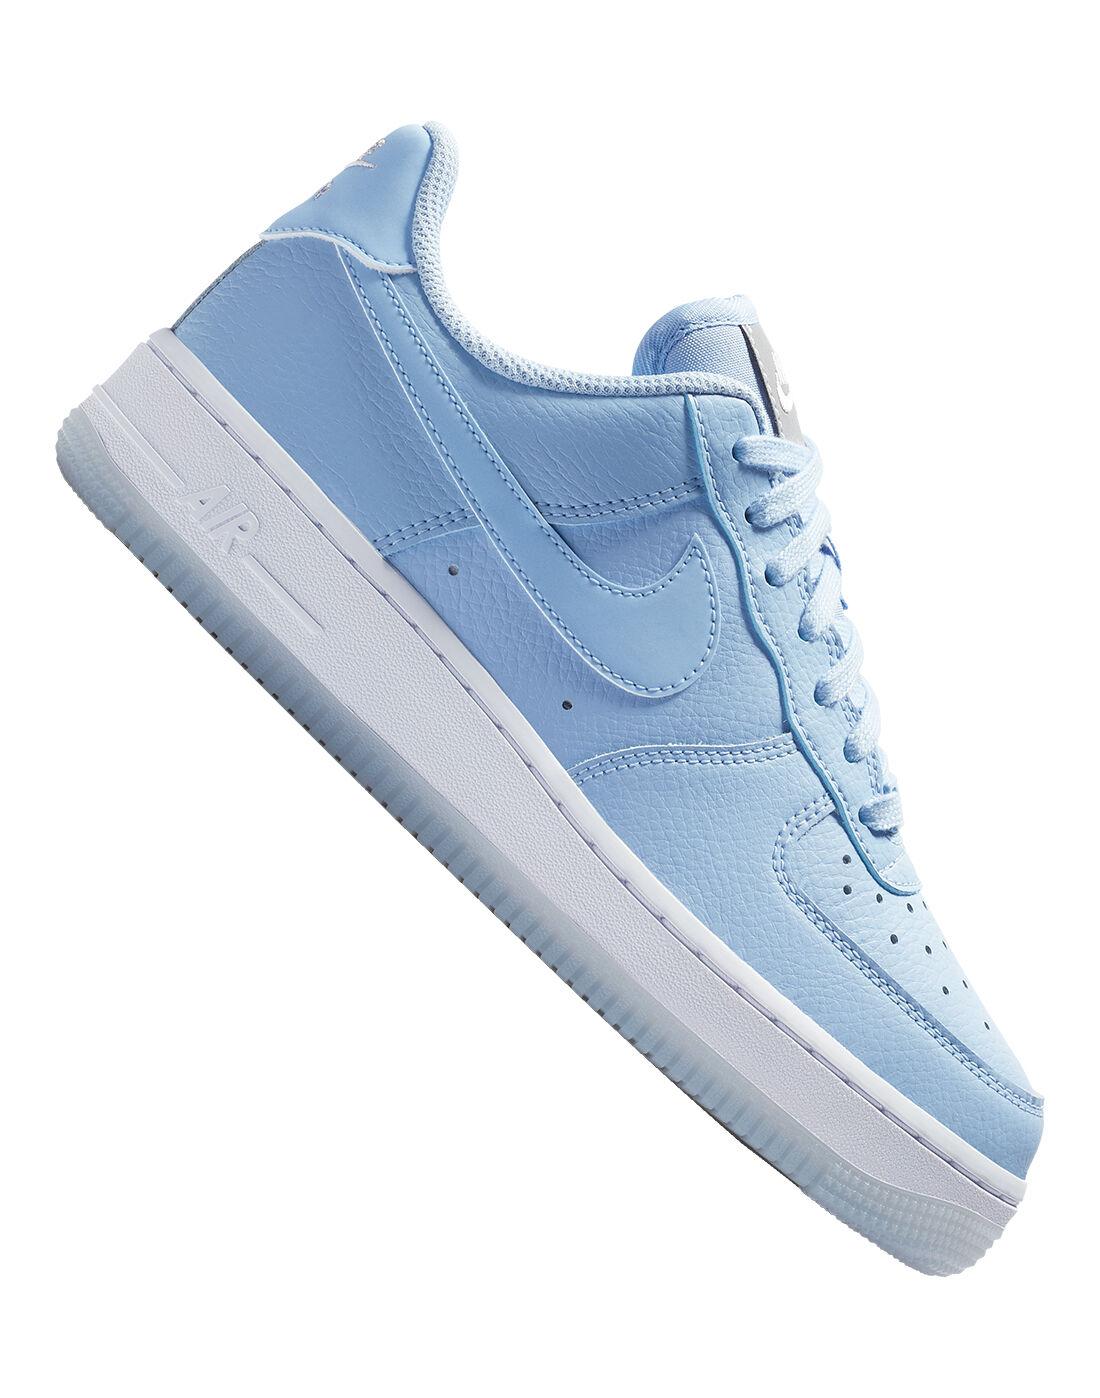 Essential Force 1 Womens Air Nike OuTPZikX